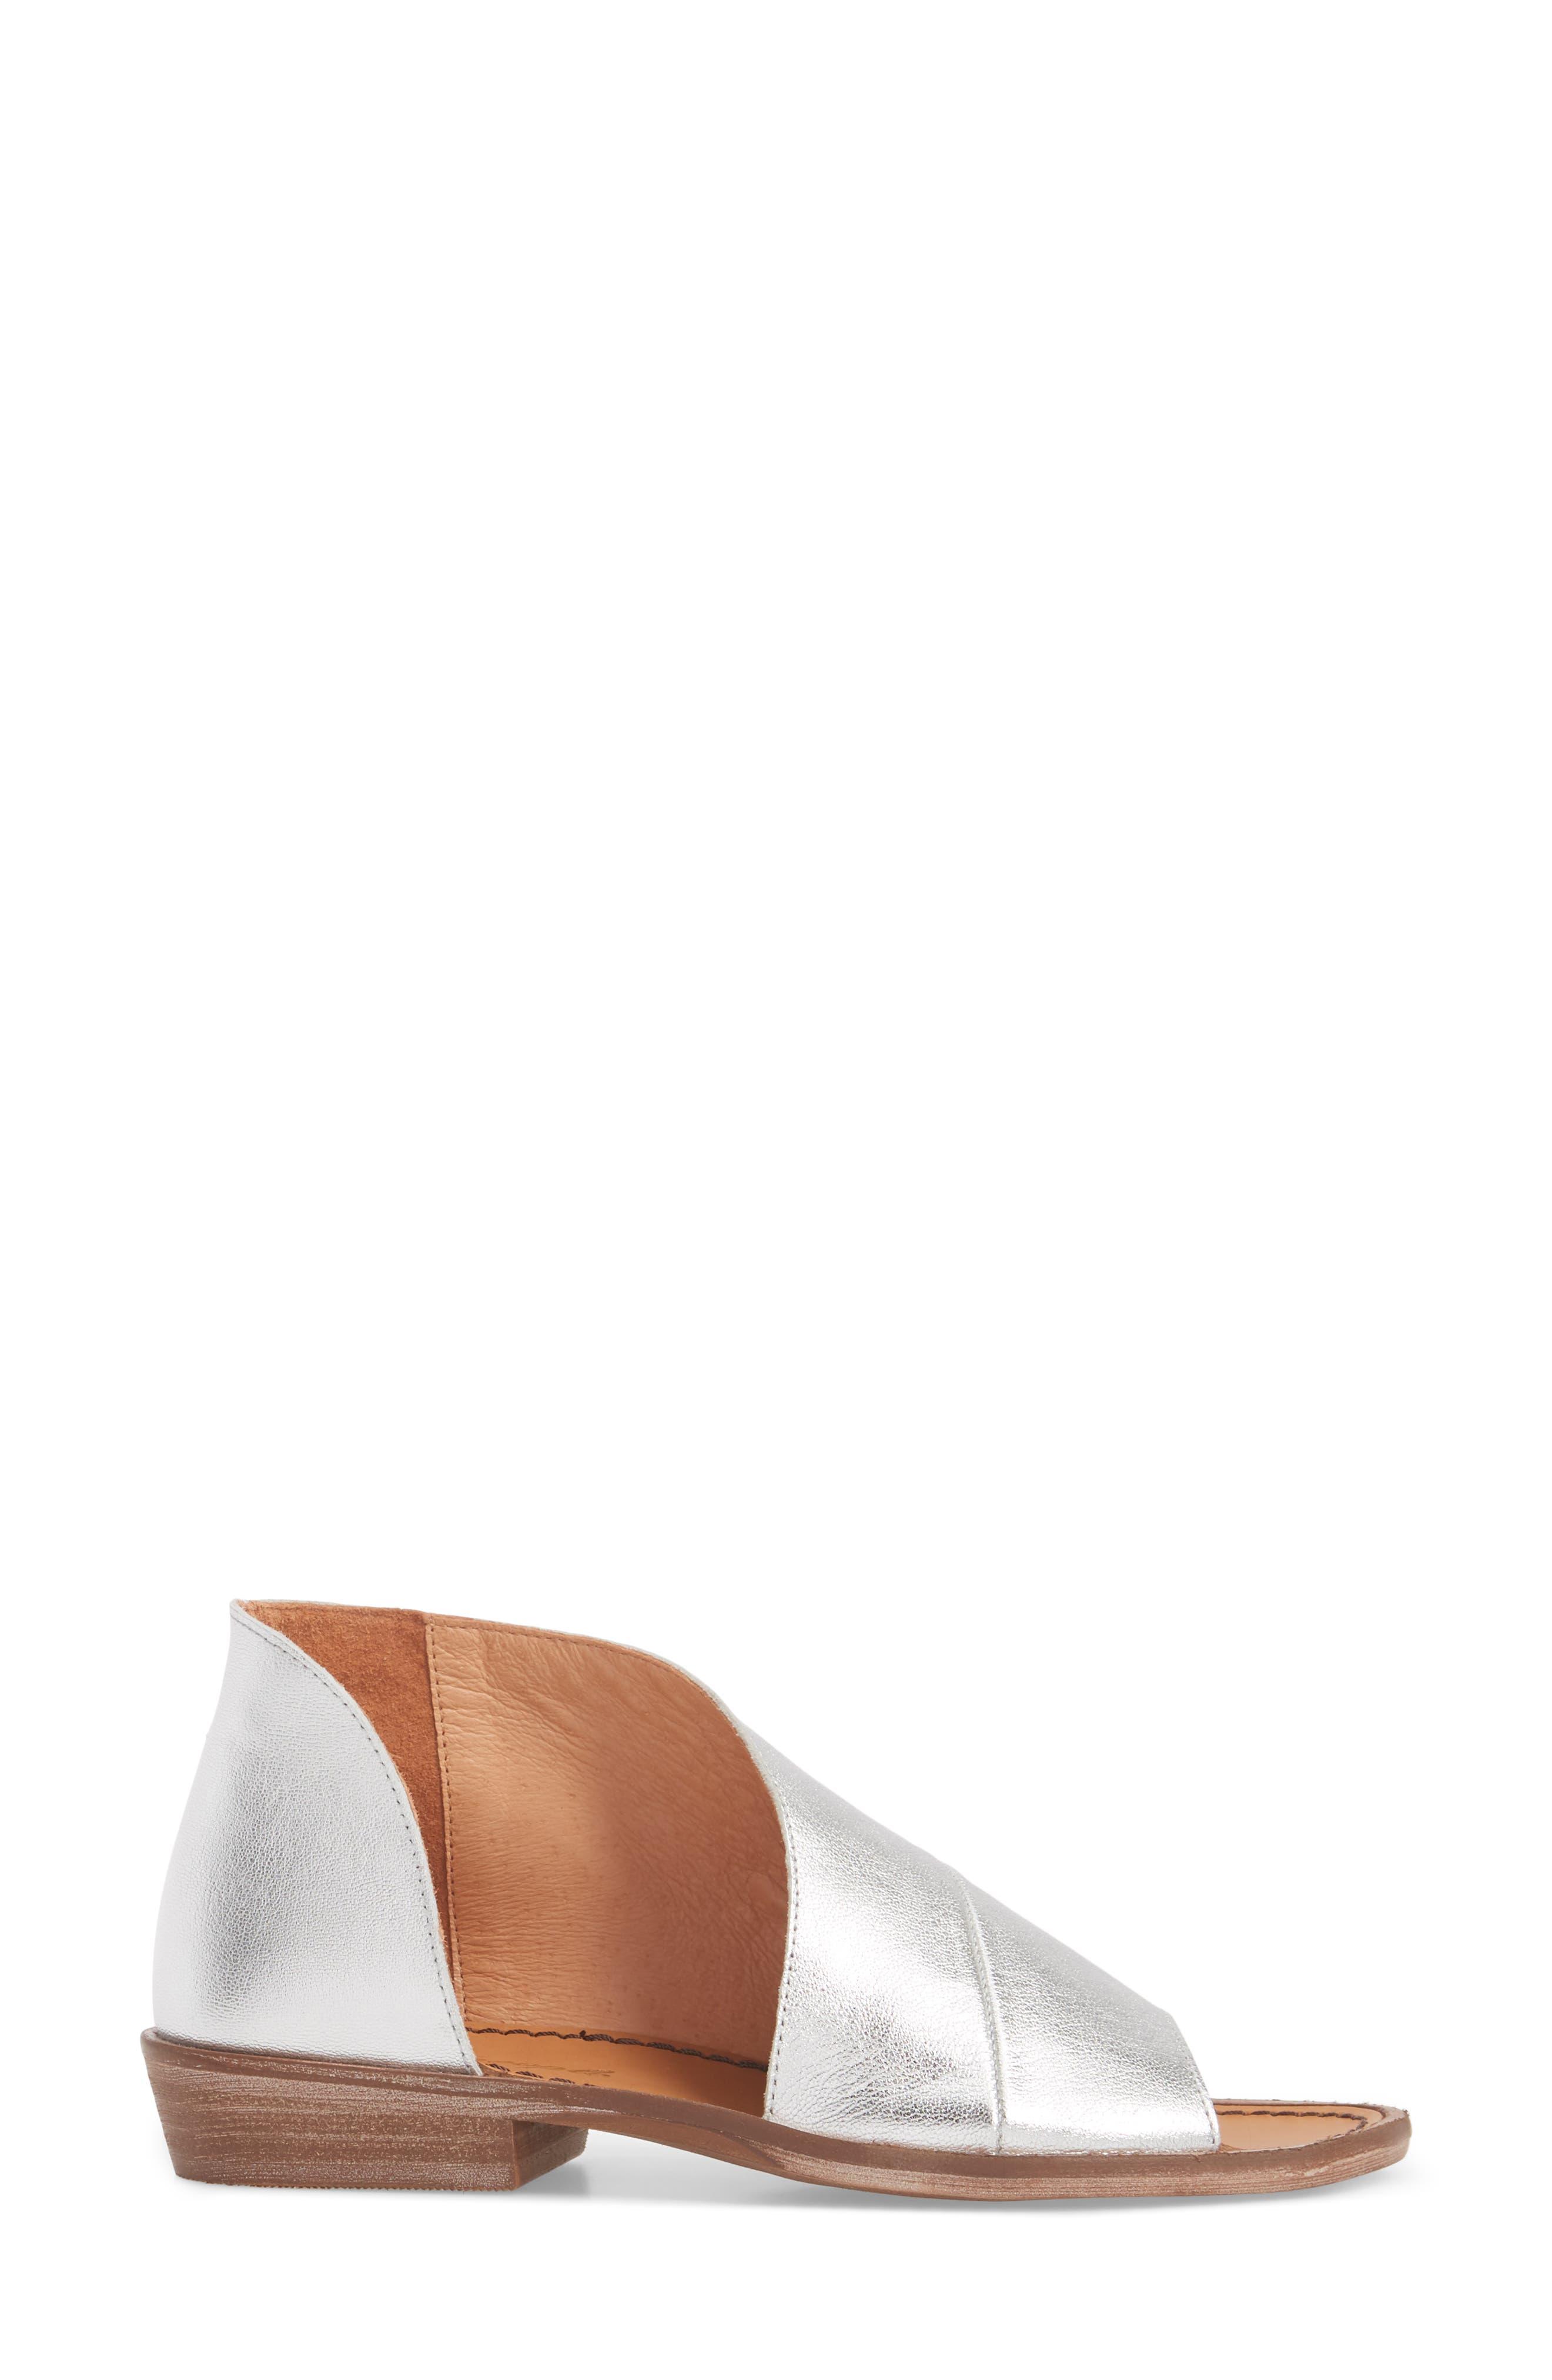 'Mont Blanc' Asymmetrical Sandal,                             Alternate thumbnail 30, color,